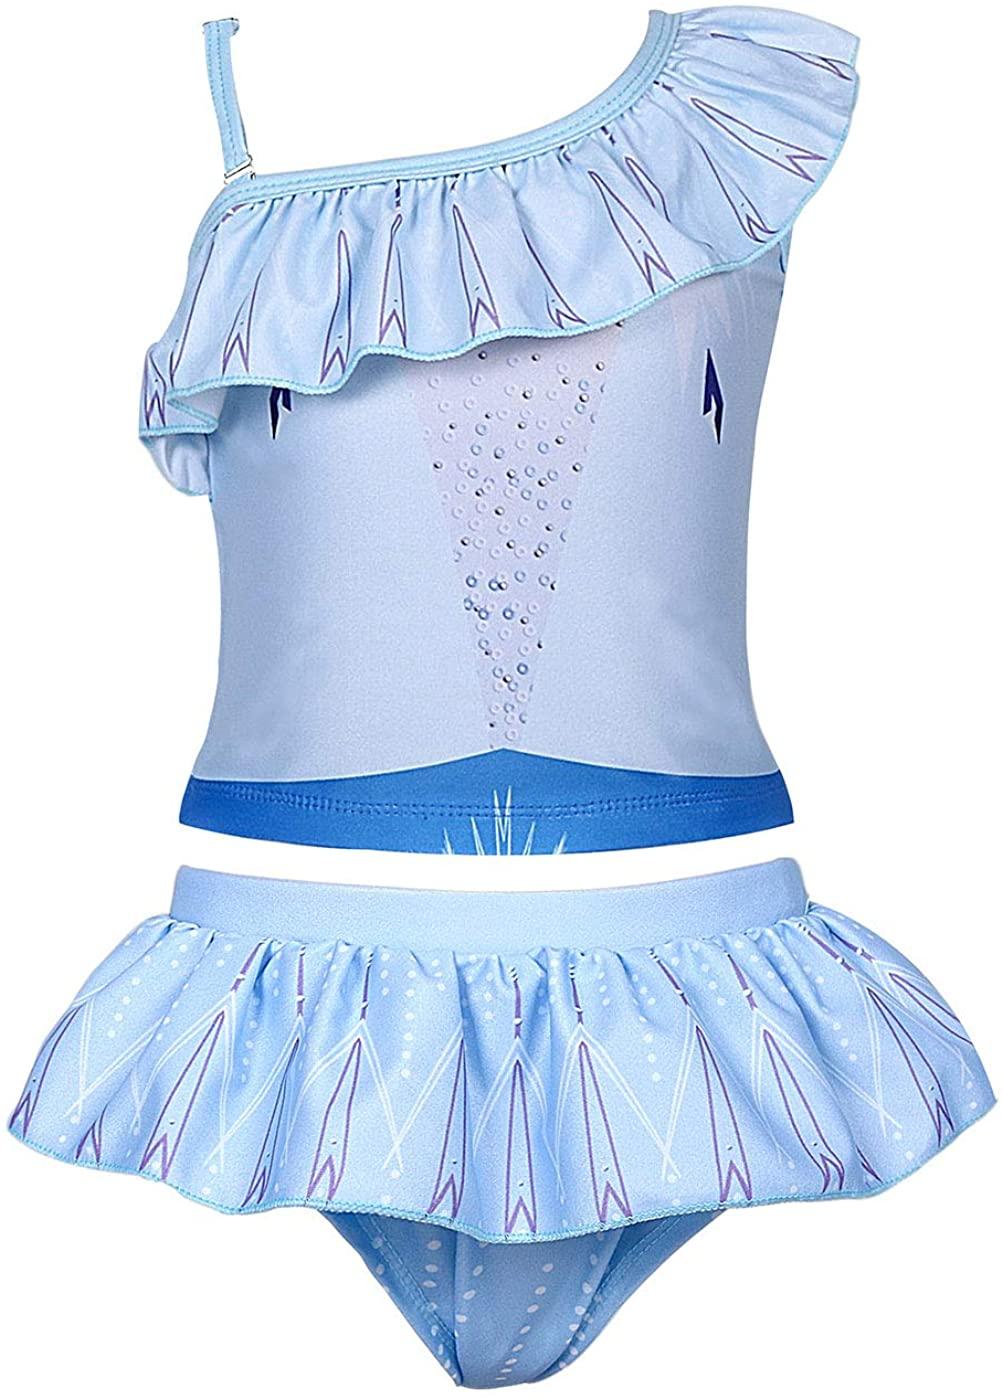 AmzBarley Girls Swimwear Two Pieces Bathing Suit Kids Princess Swimsuits Ruffle Swimming Suit One Shoulder Bikini Holiday Beach Sport Pool Party Sunsuit Blue Size 5-6Years